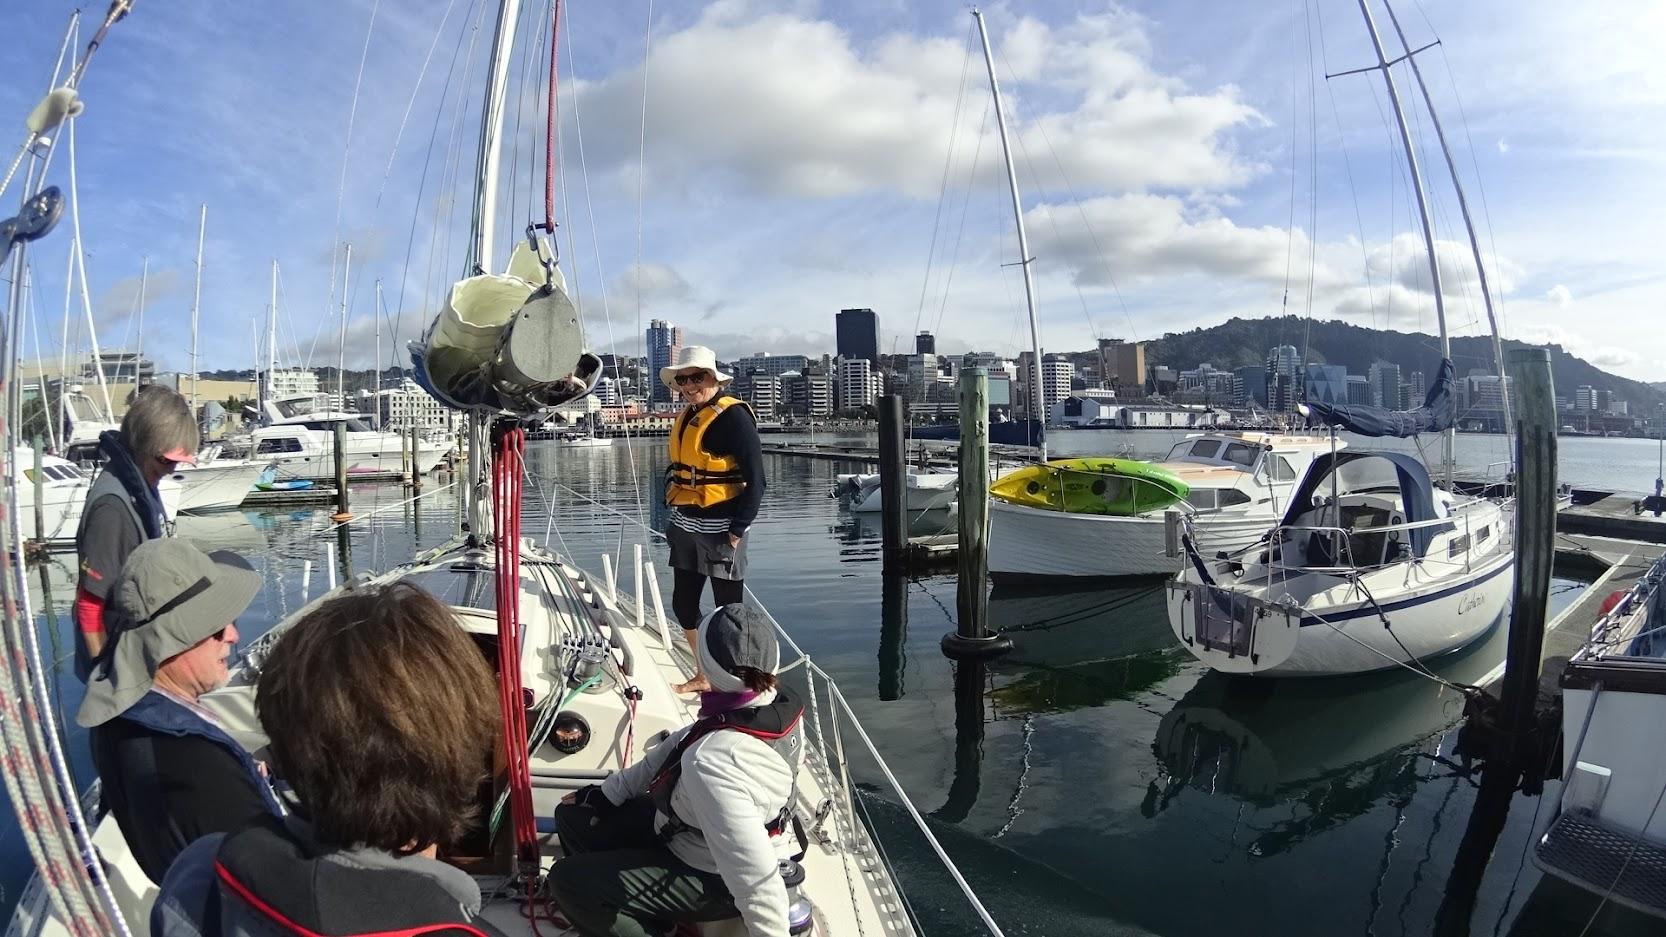 Leaving Chaffers Marina